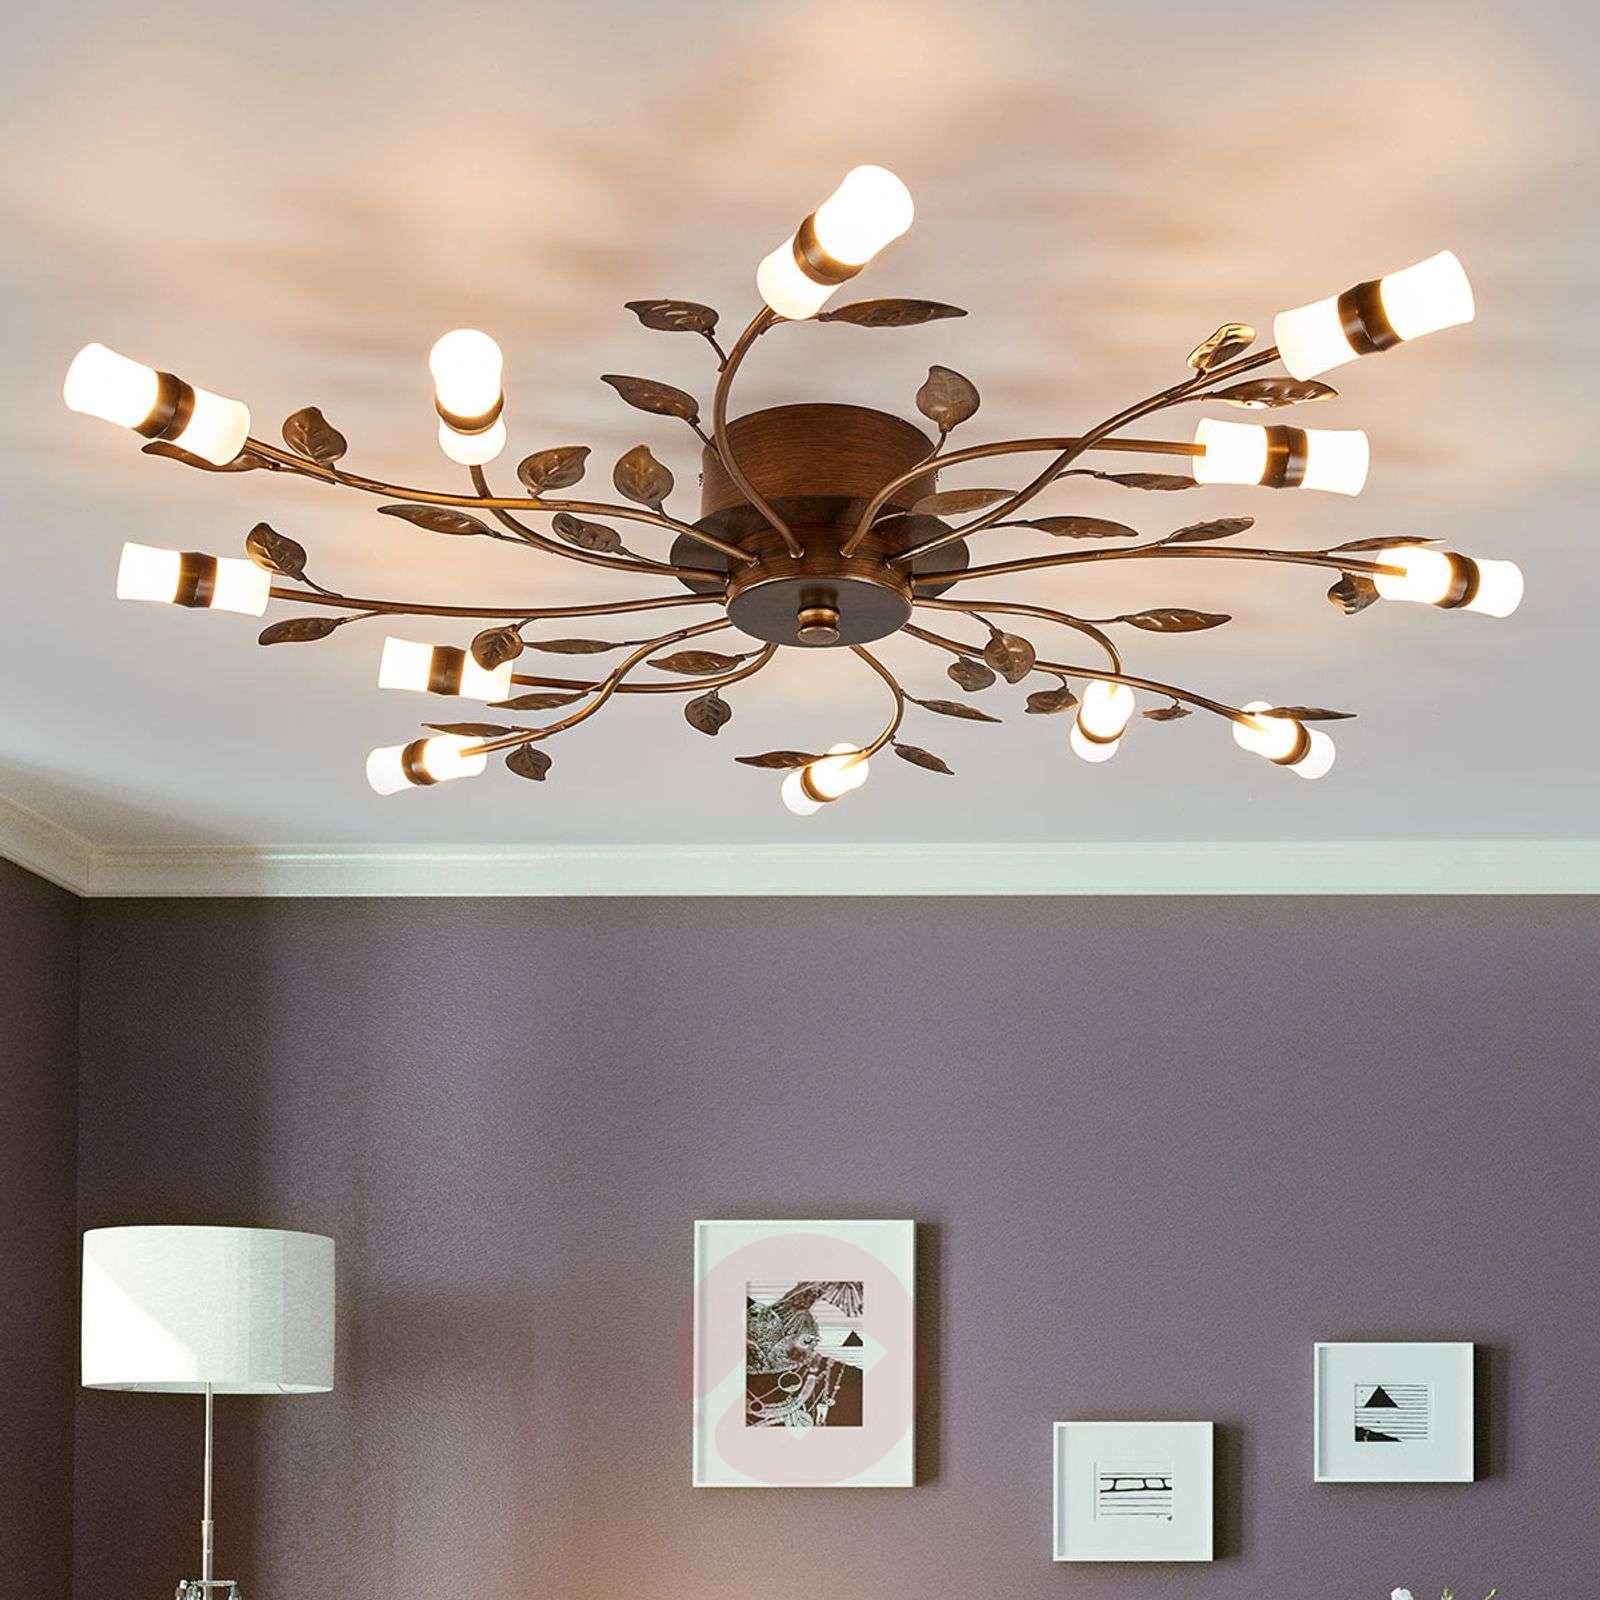 LED ceiling light Milian with a leaf design-9981026-02